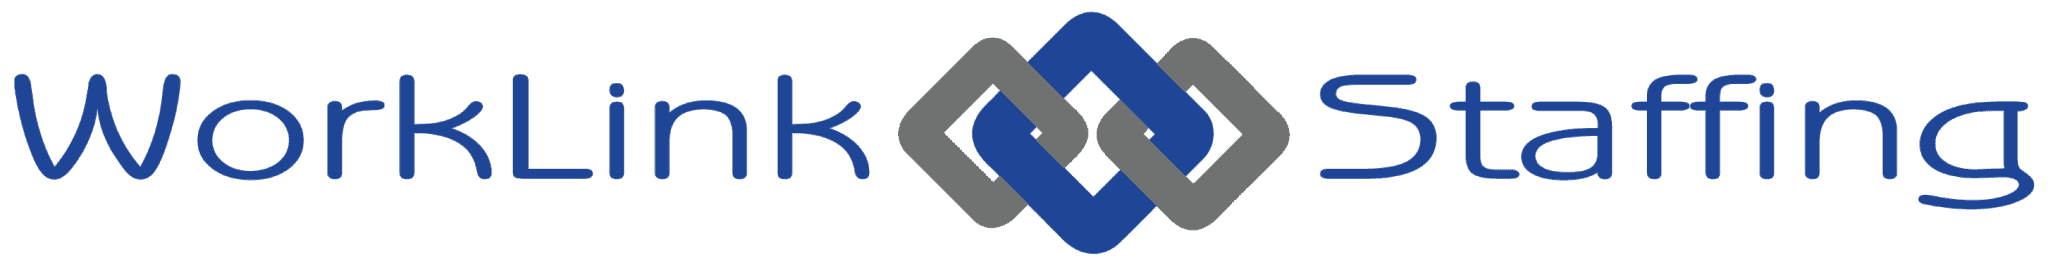 WLS_web_logo-01